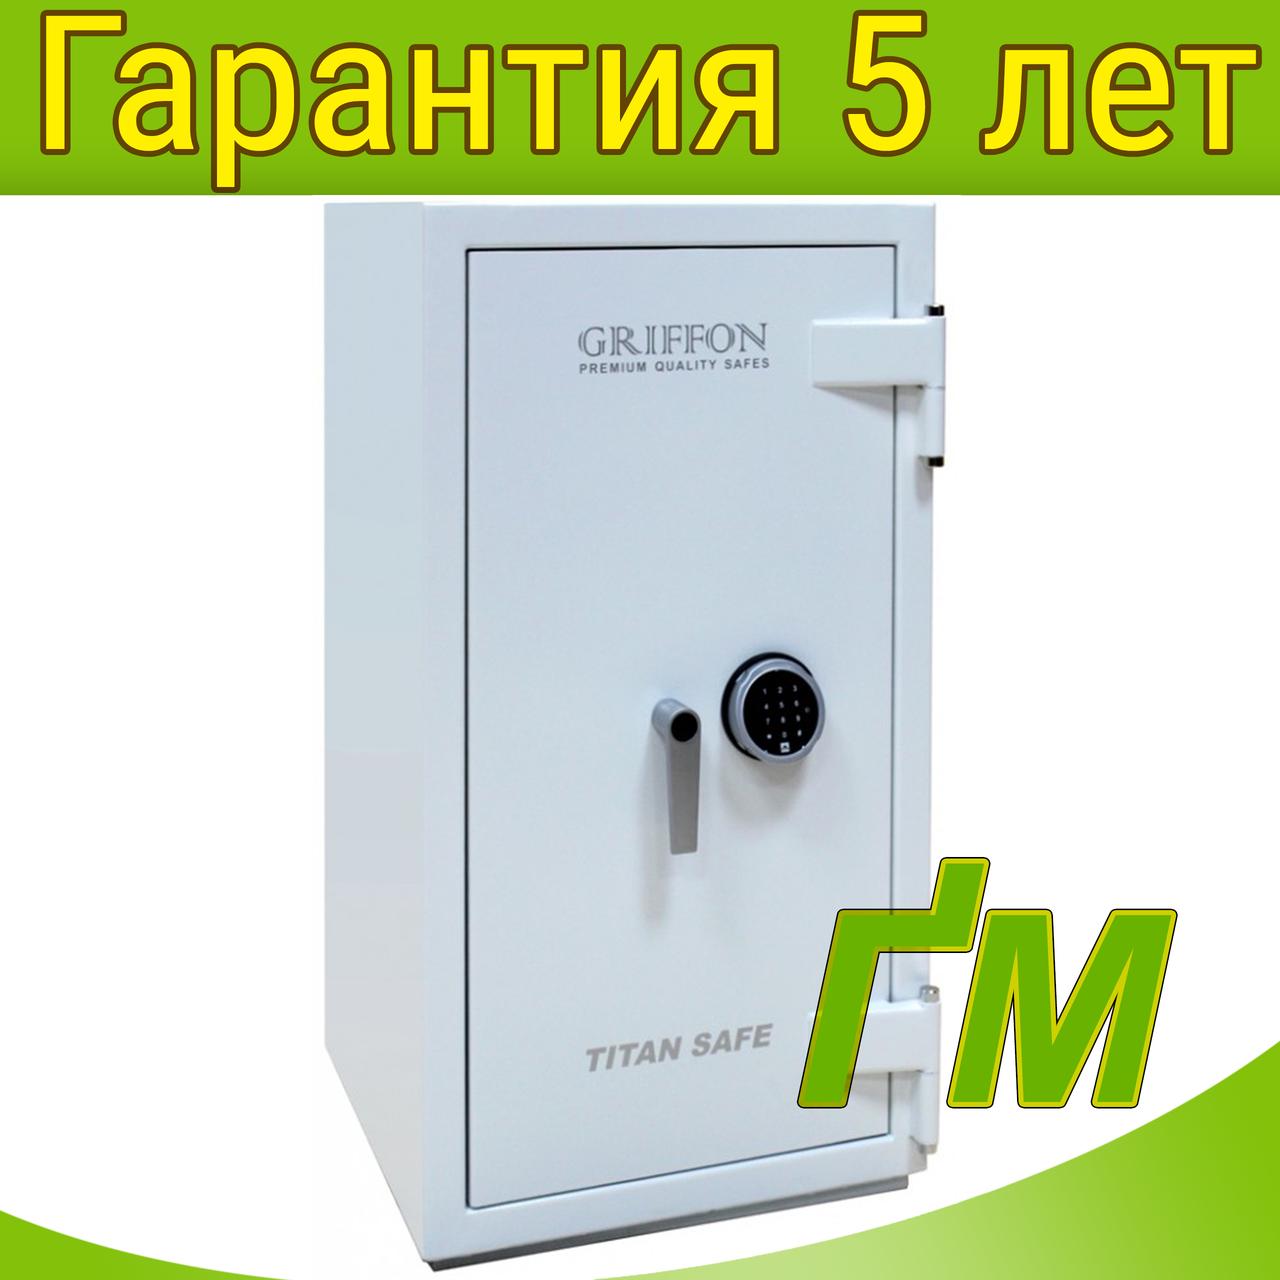 Сейф огневзломостойкий CL III.90.E White